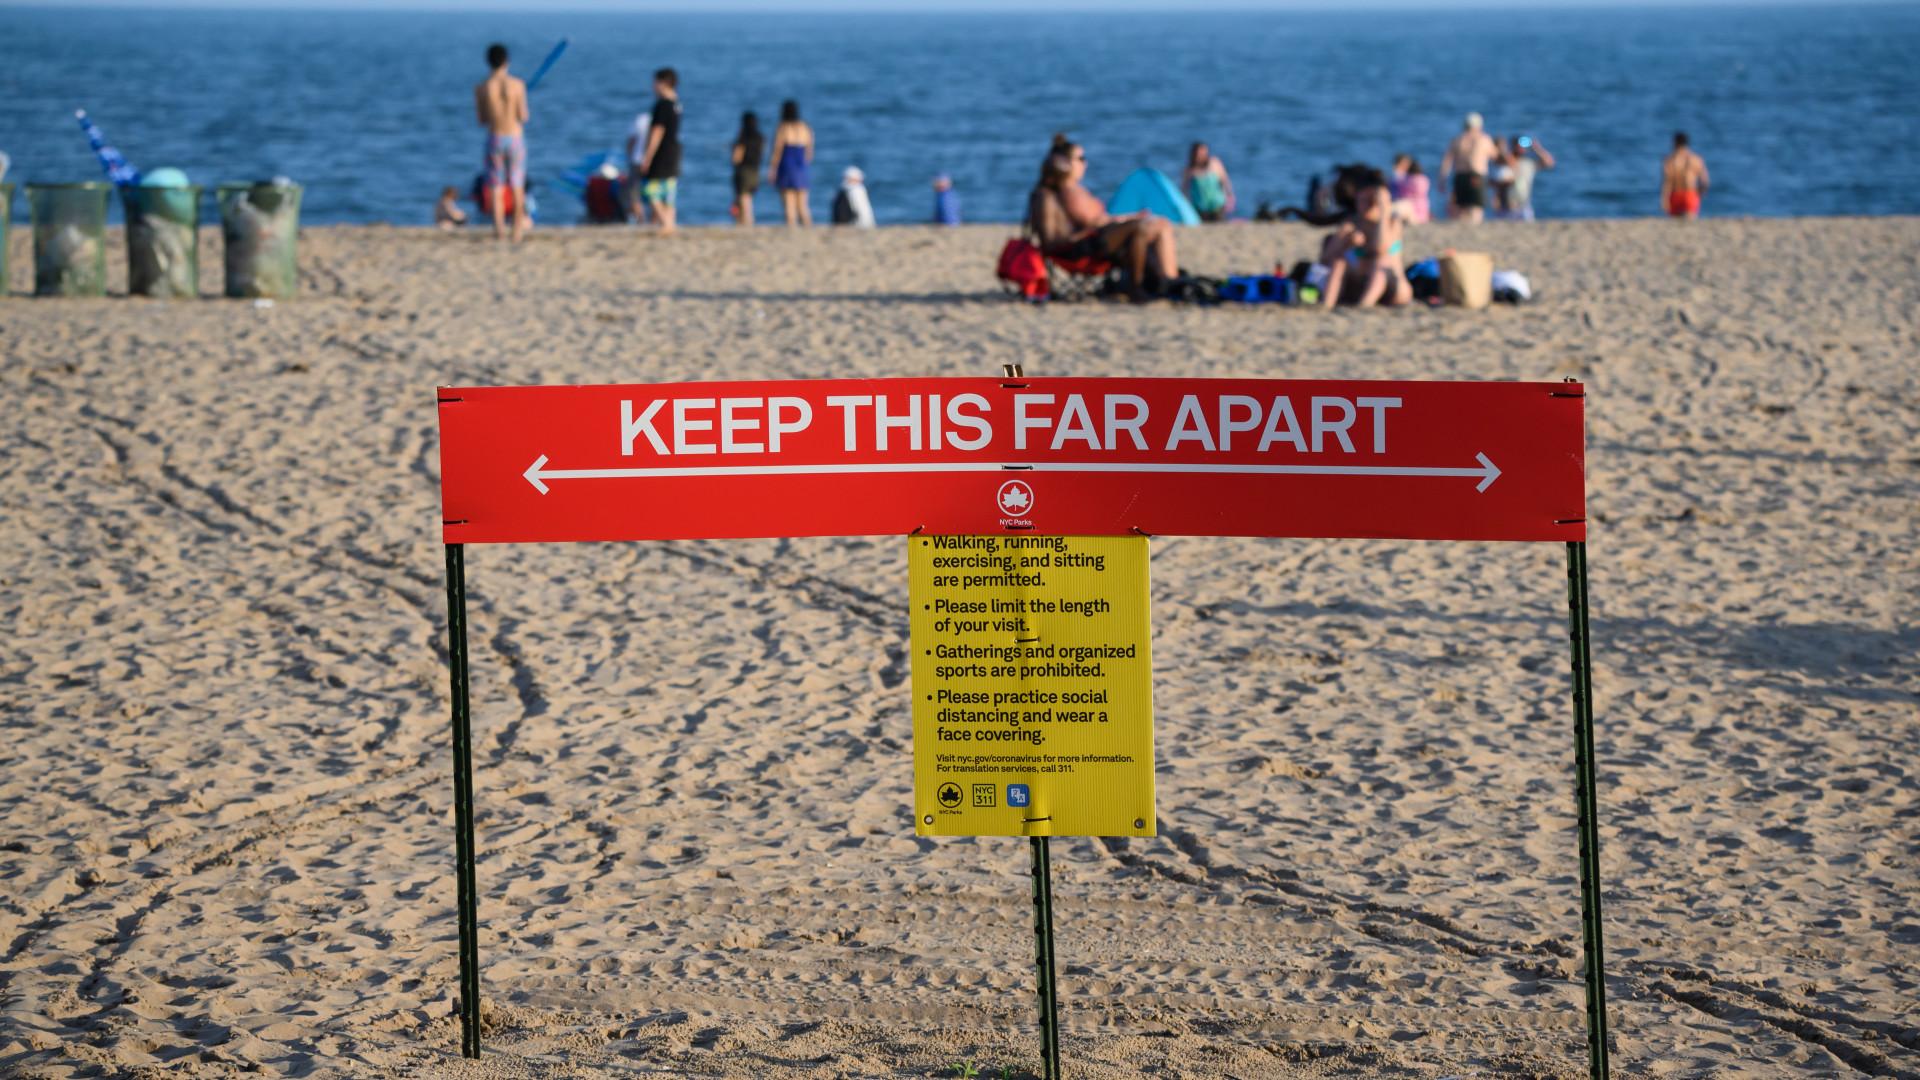 fórum pufók a tengerparton)